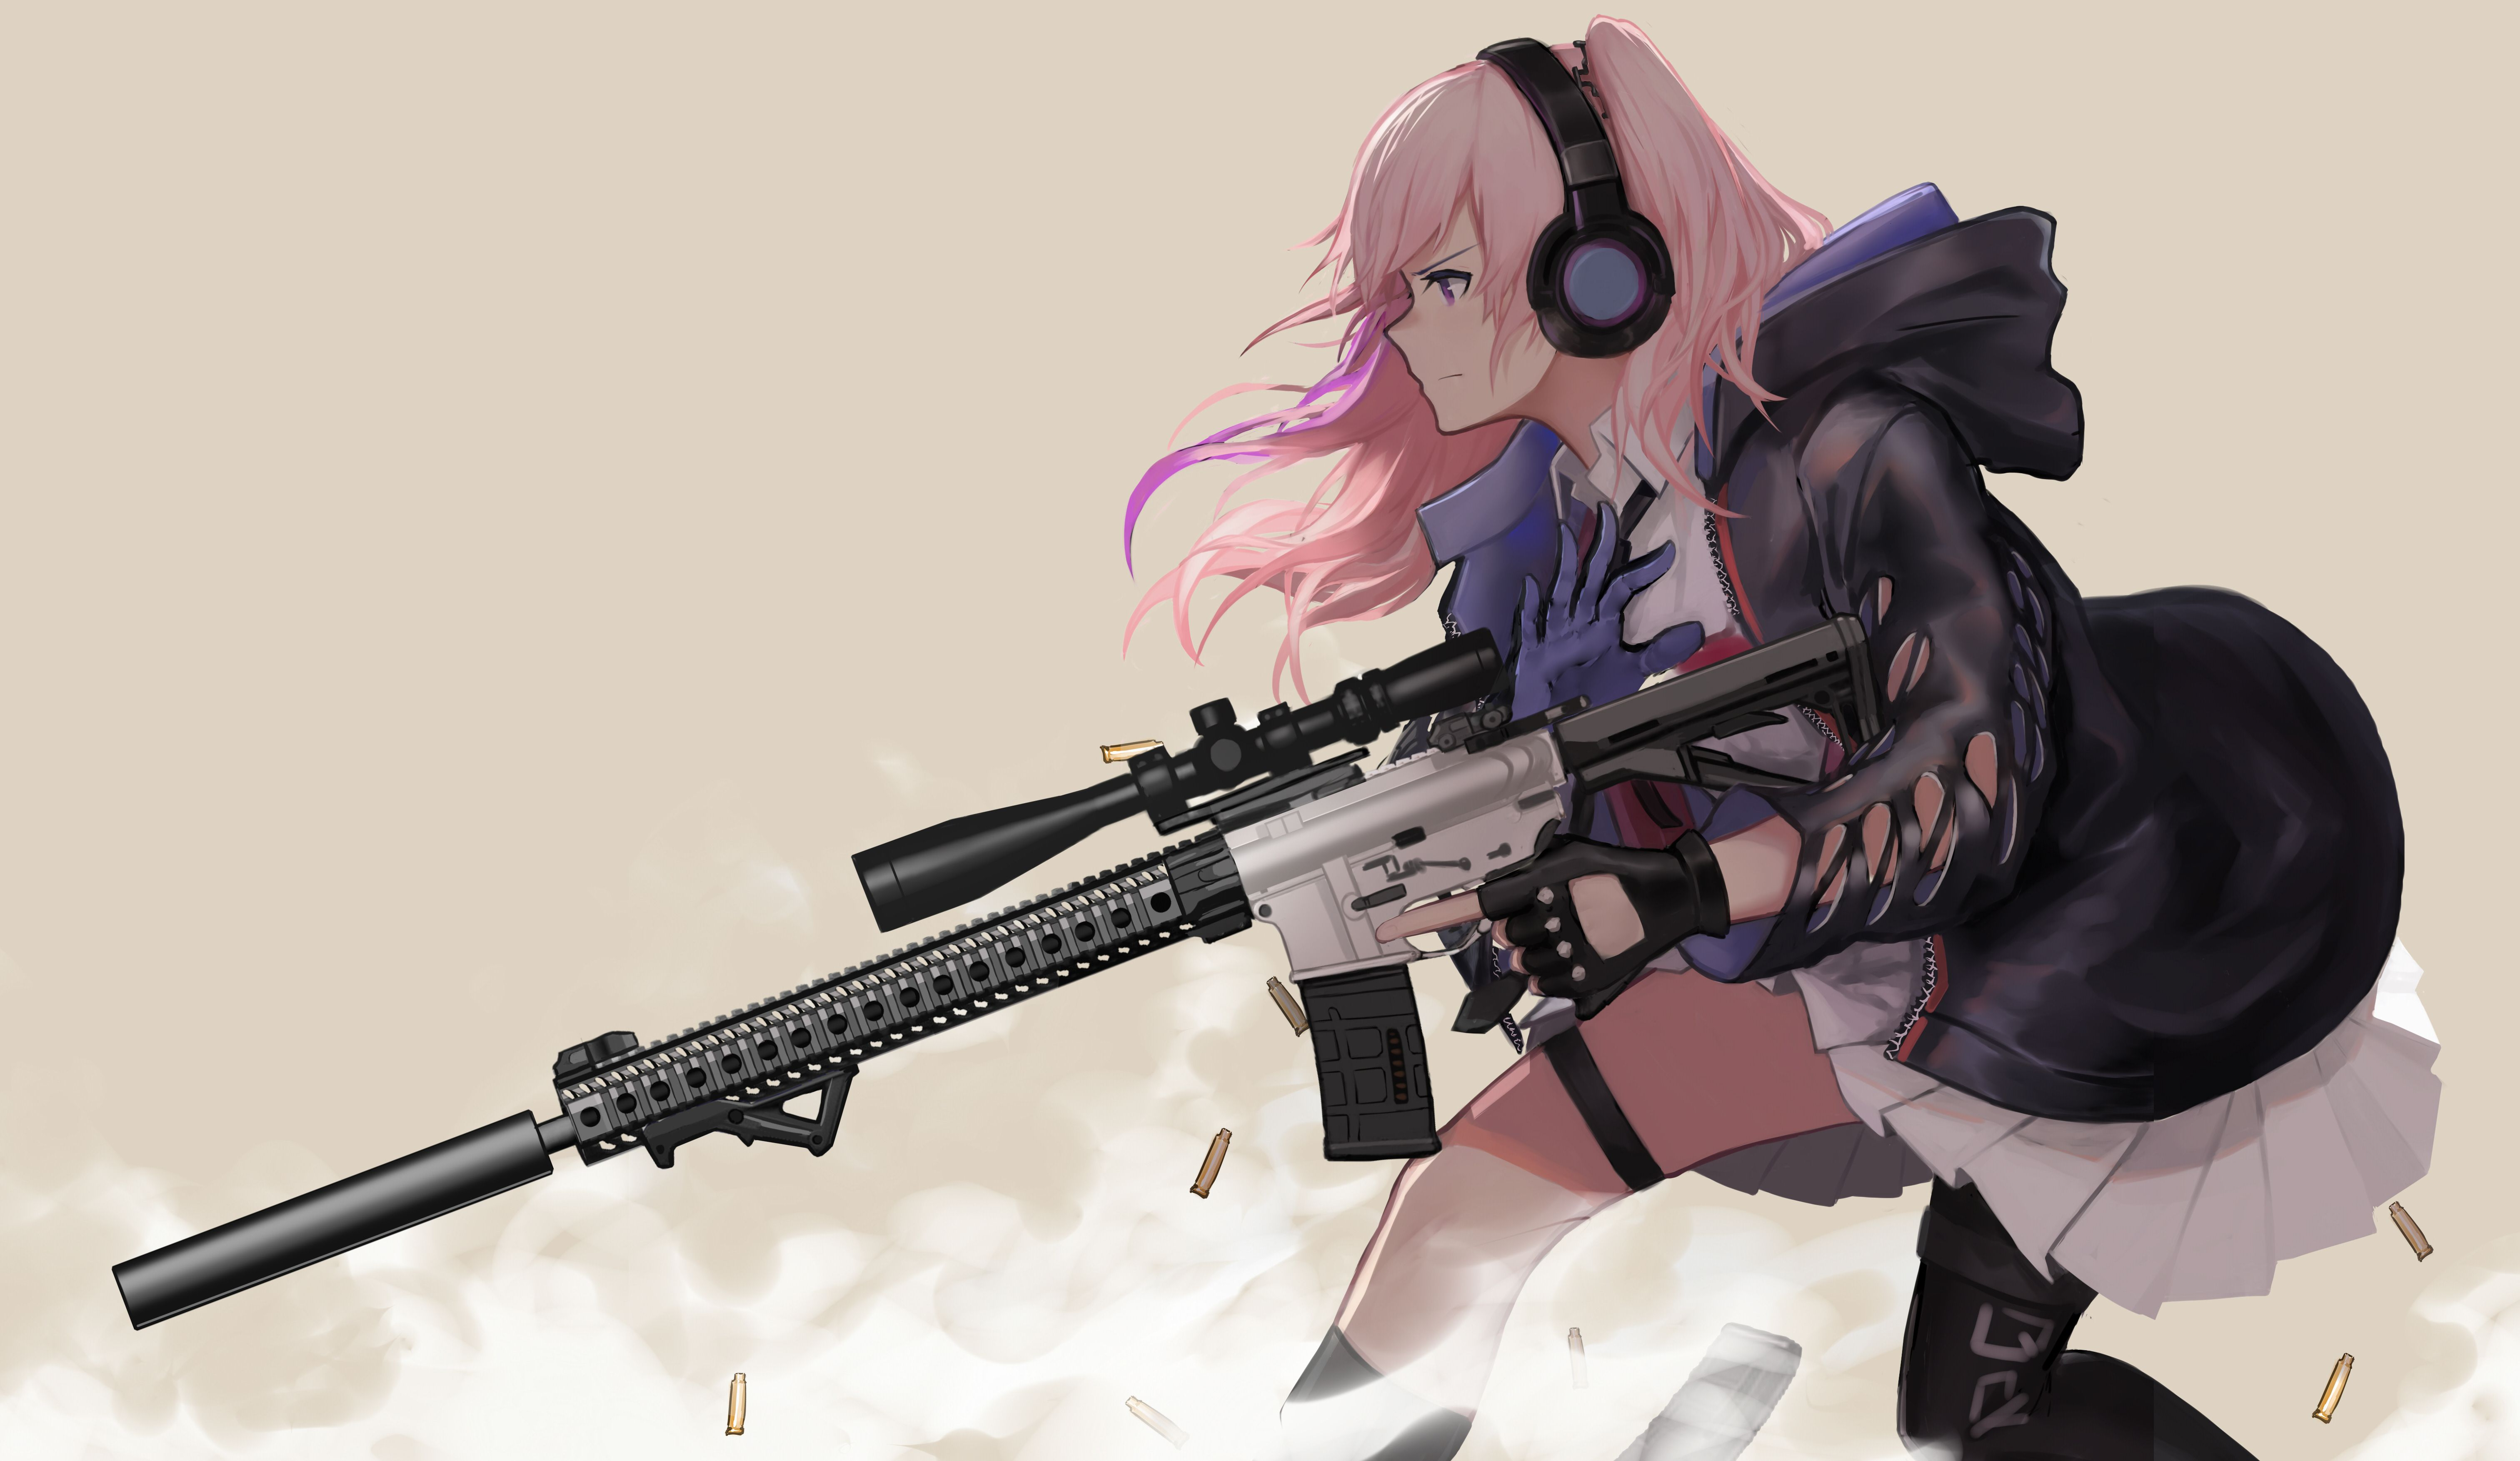 10k Anime Girl Ps10 Gun Wallpapers - Wallpaper Cave